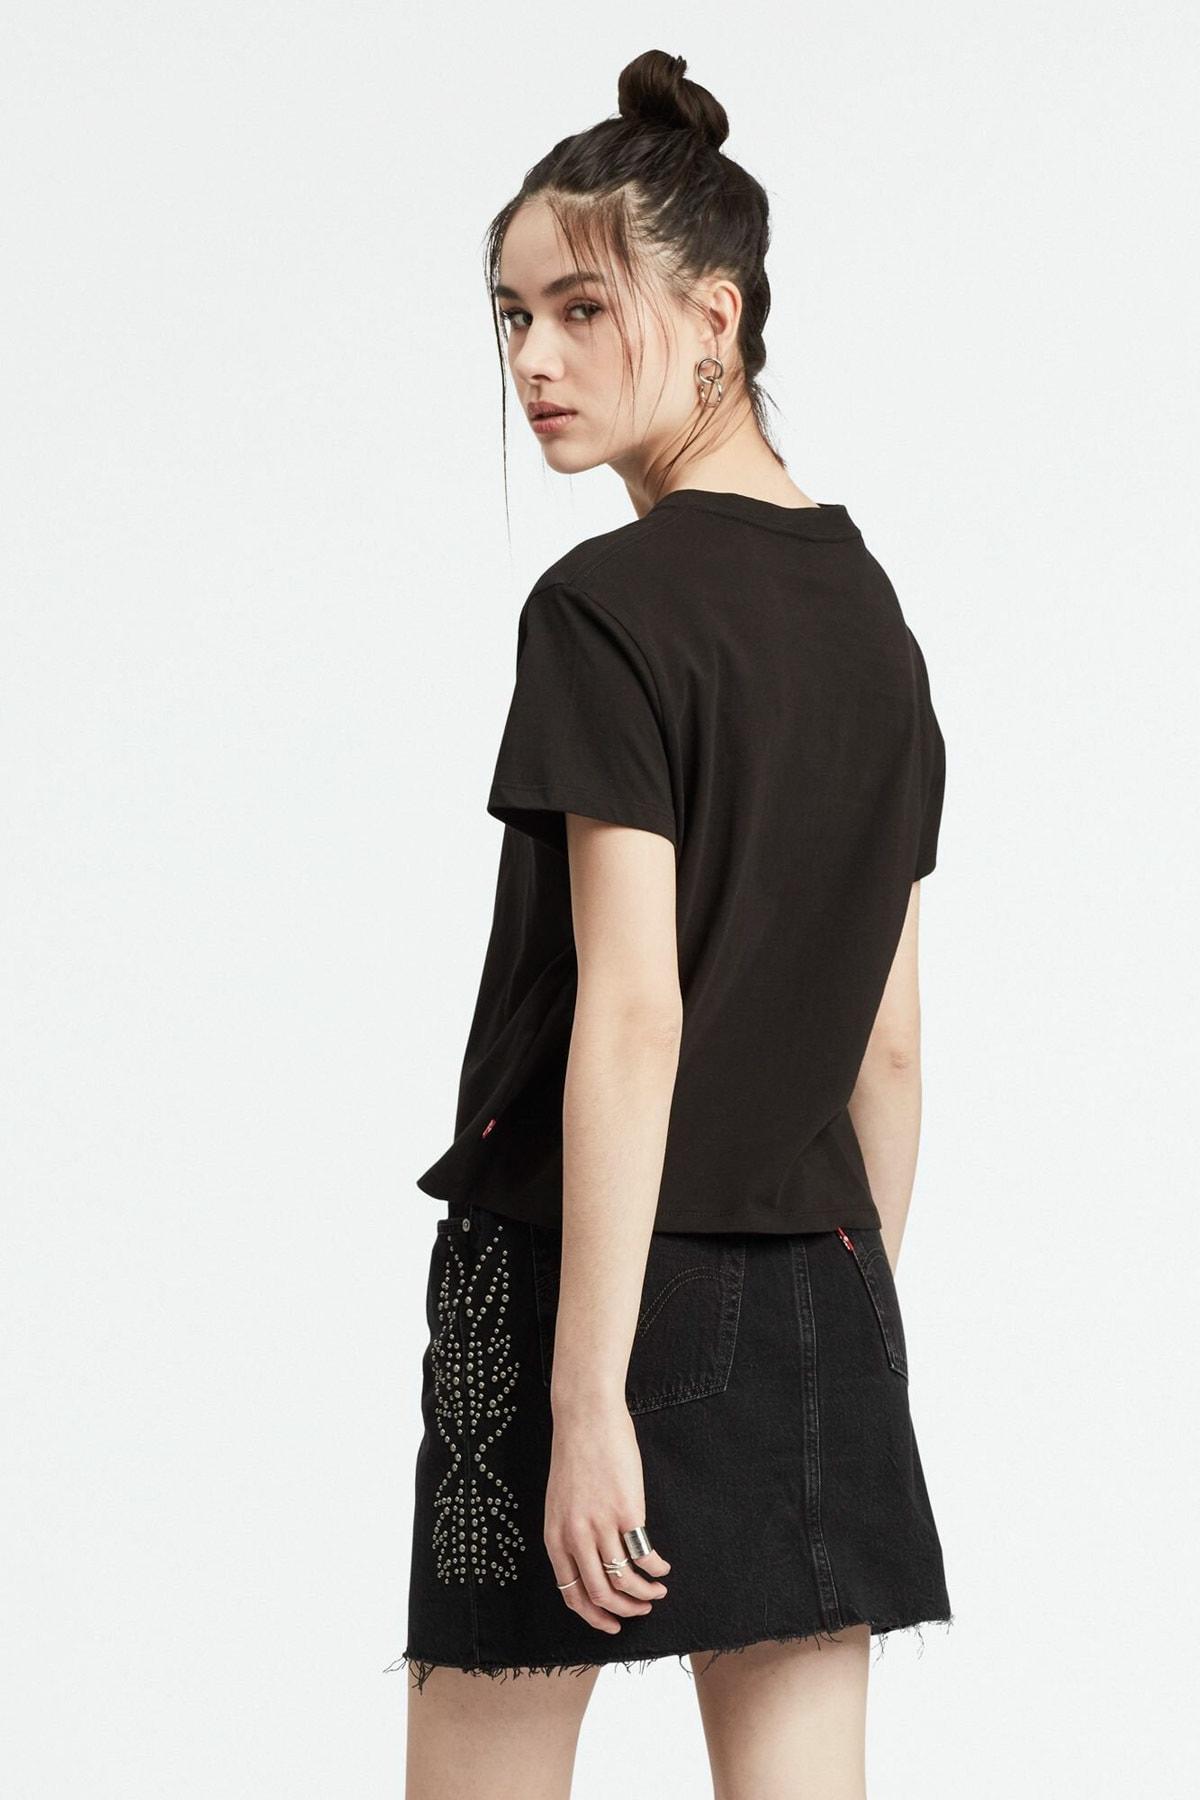 Levi's Kadın T-shirt 69973-0052 -1 2